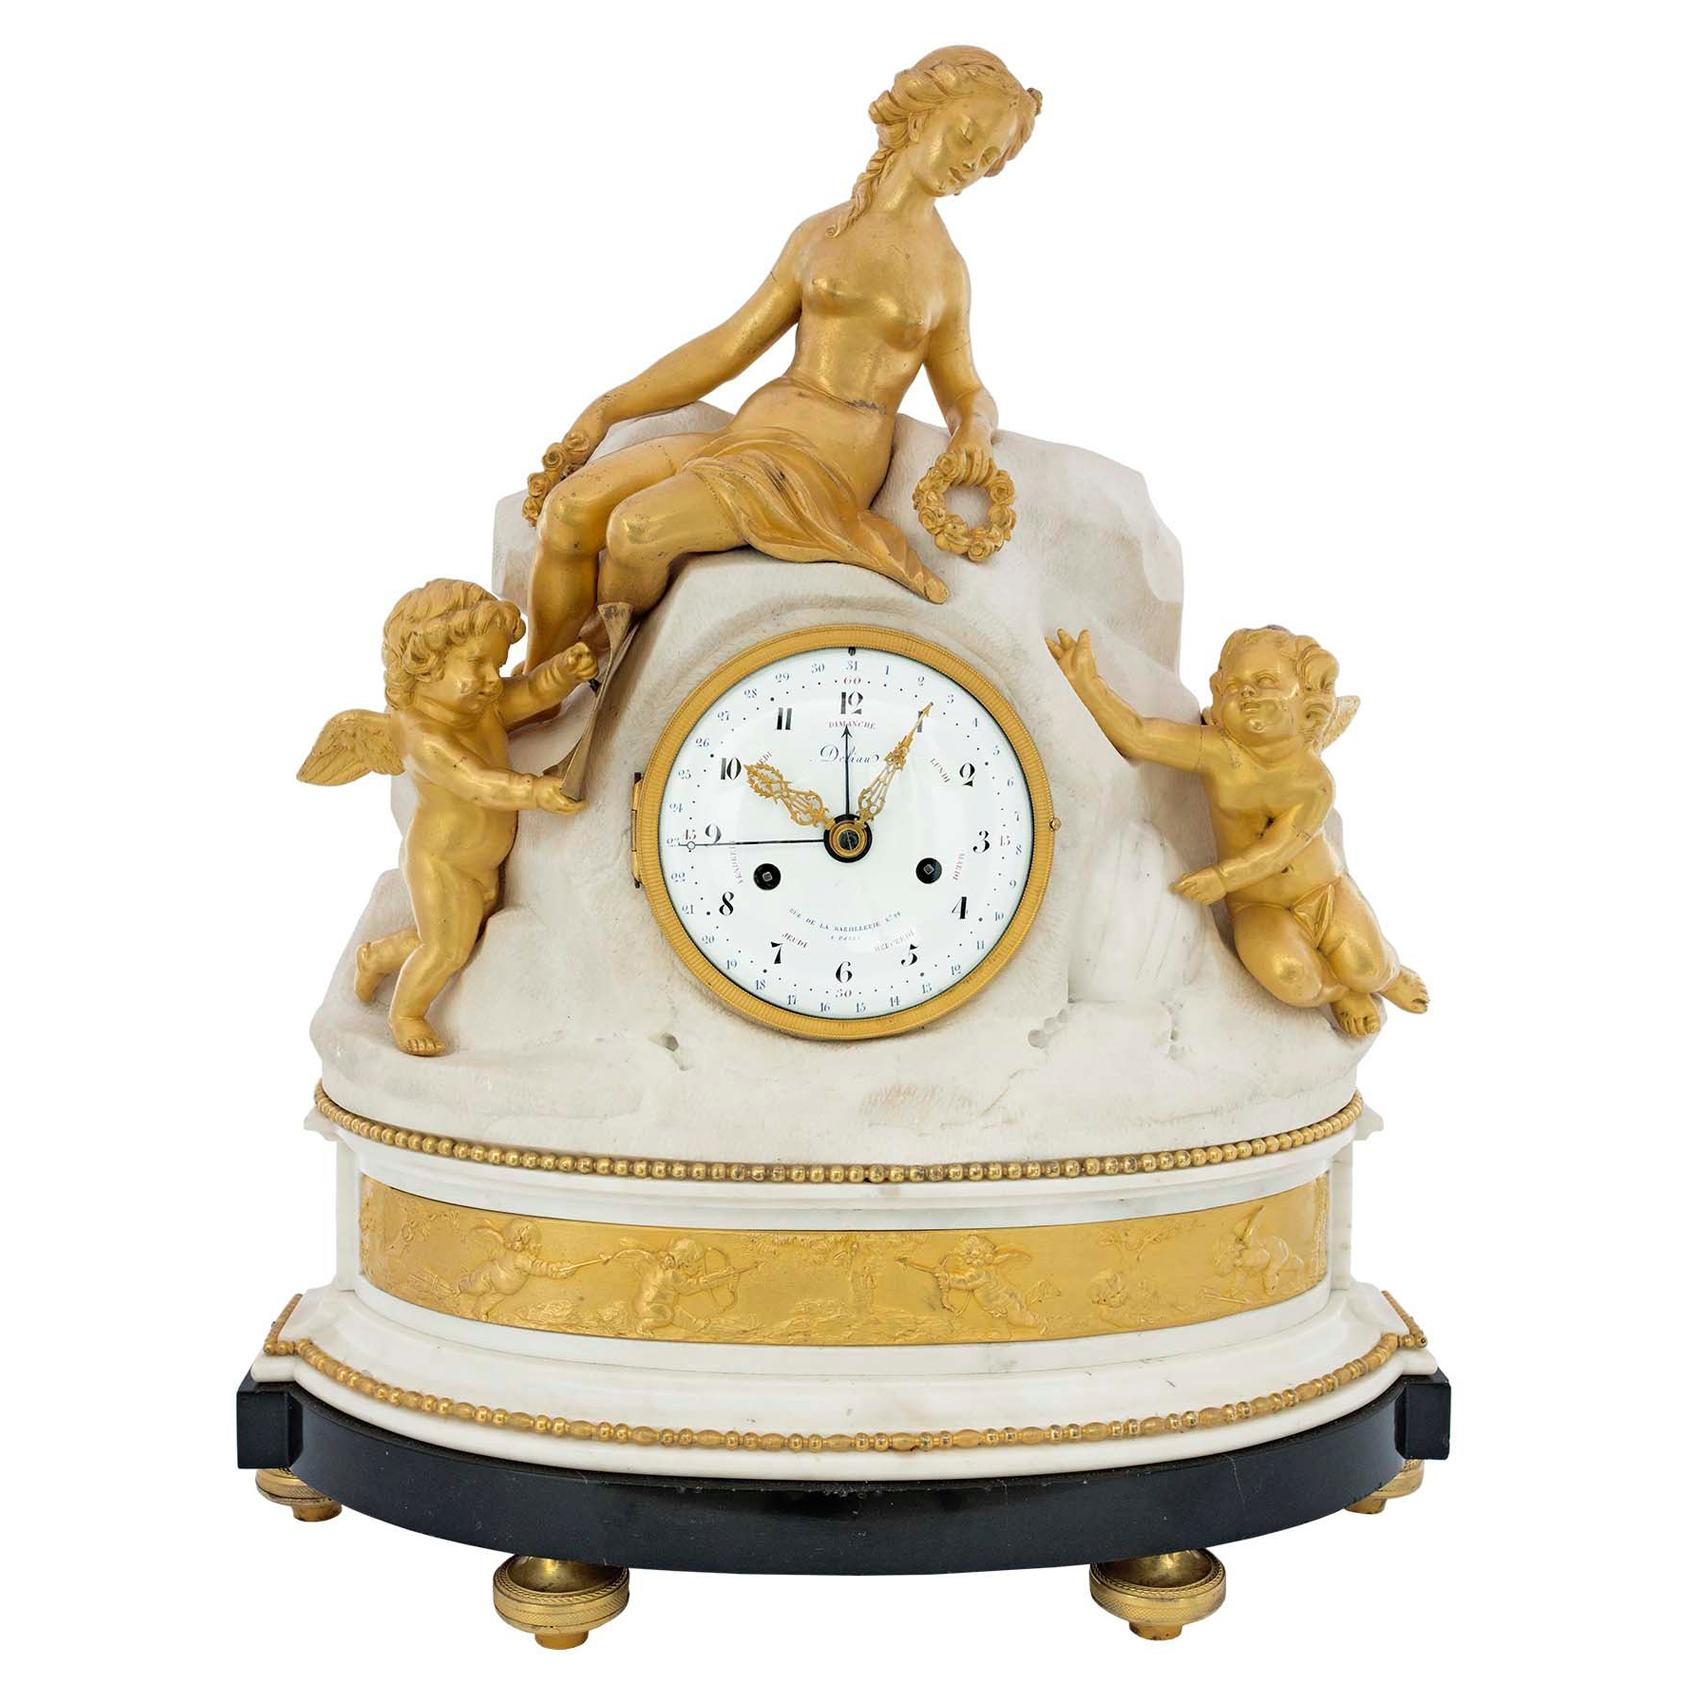 French Late 18th Century Louis XVI Period Clock Signed Déliau